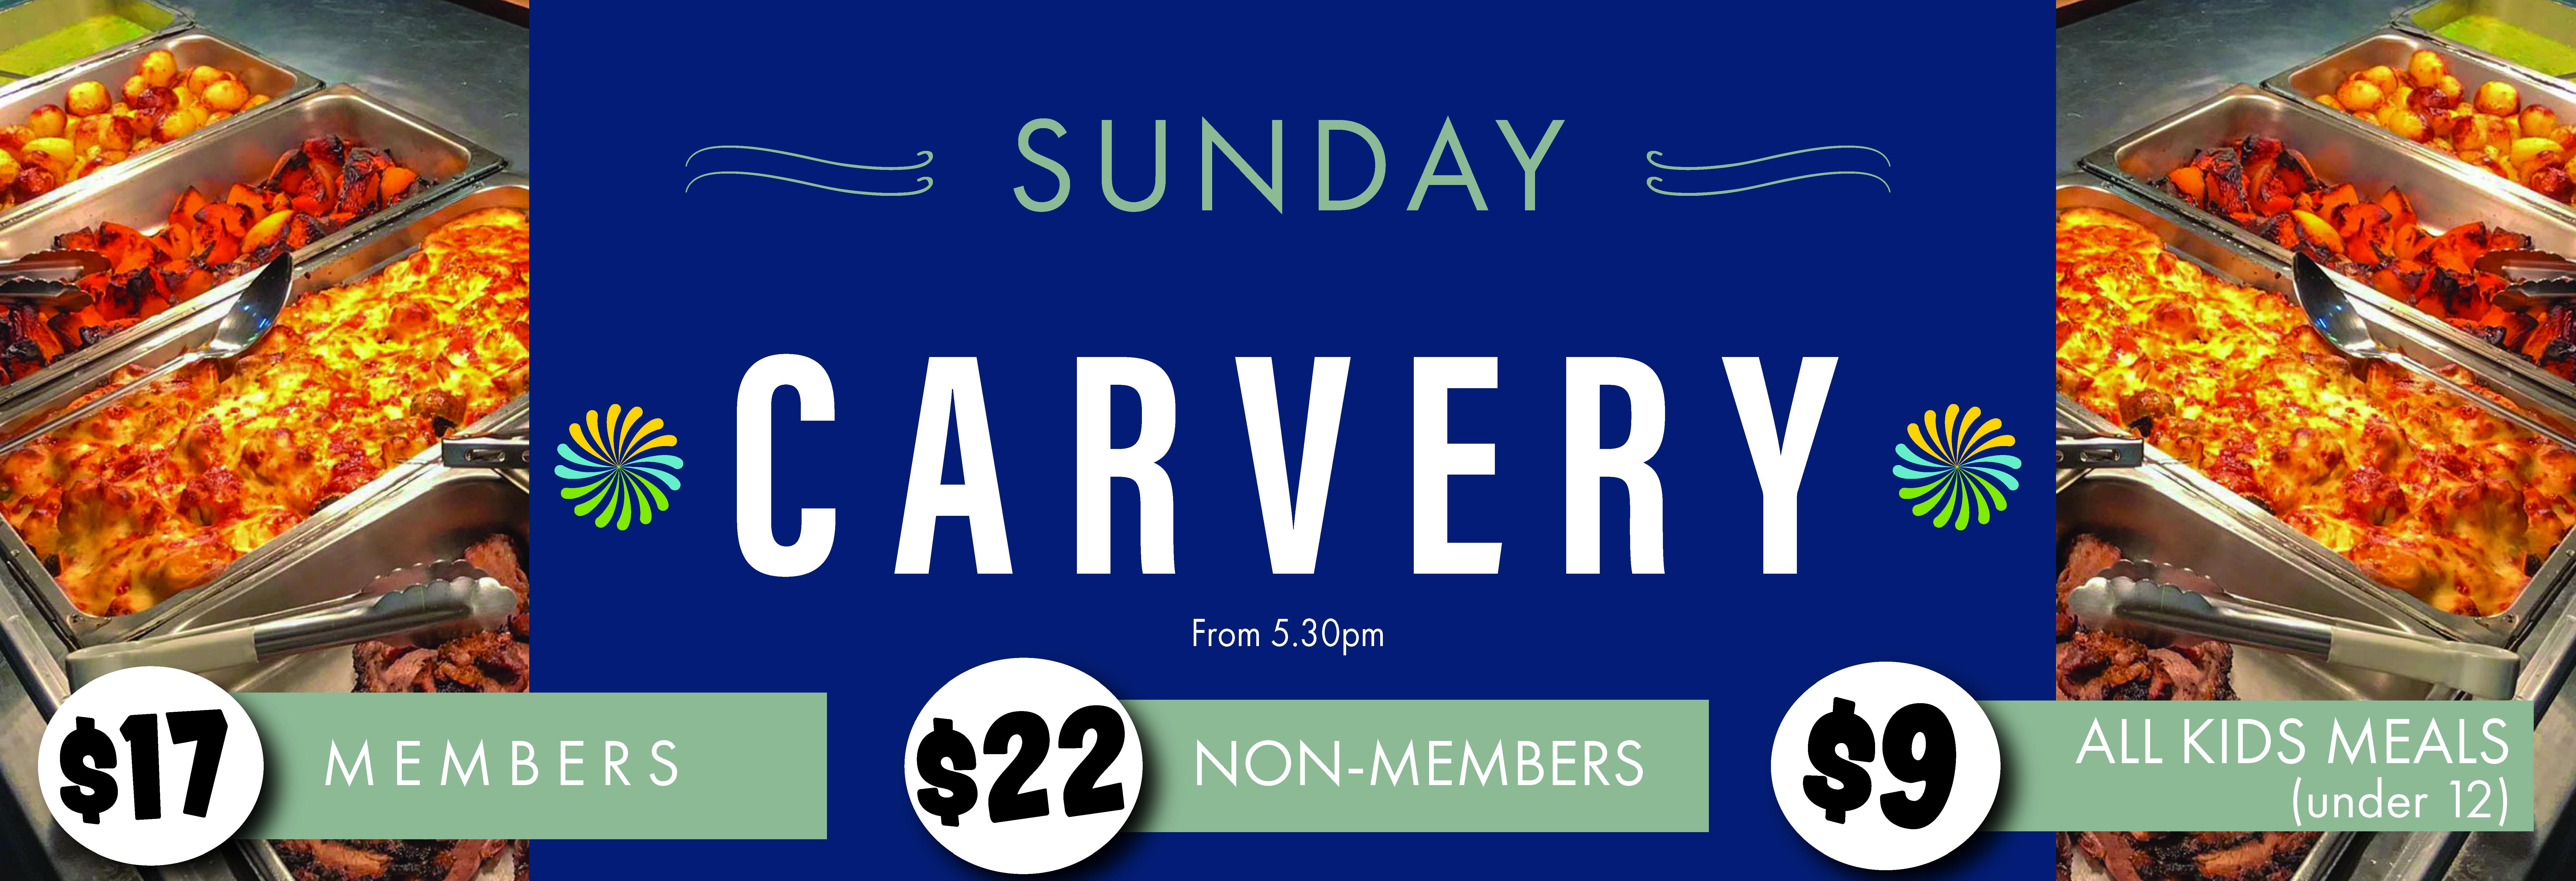 Sunday Carvery BANNER